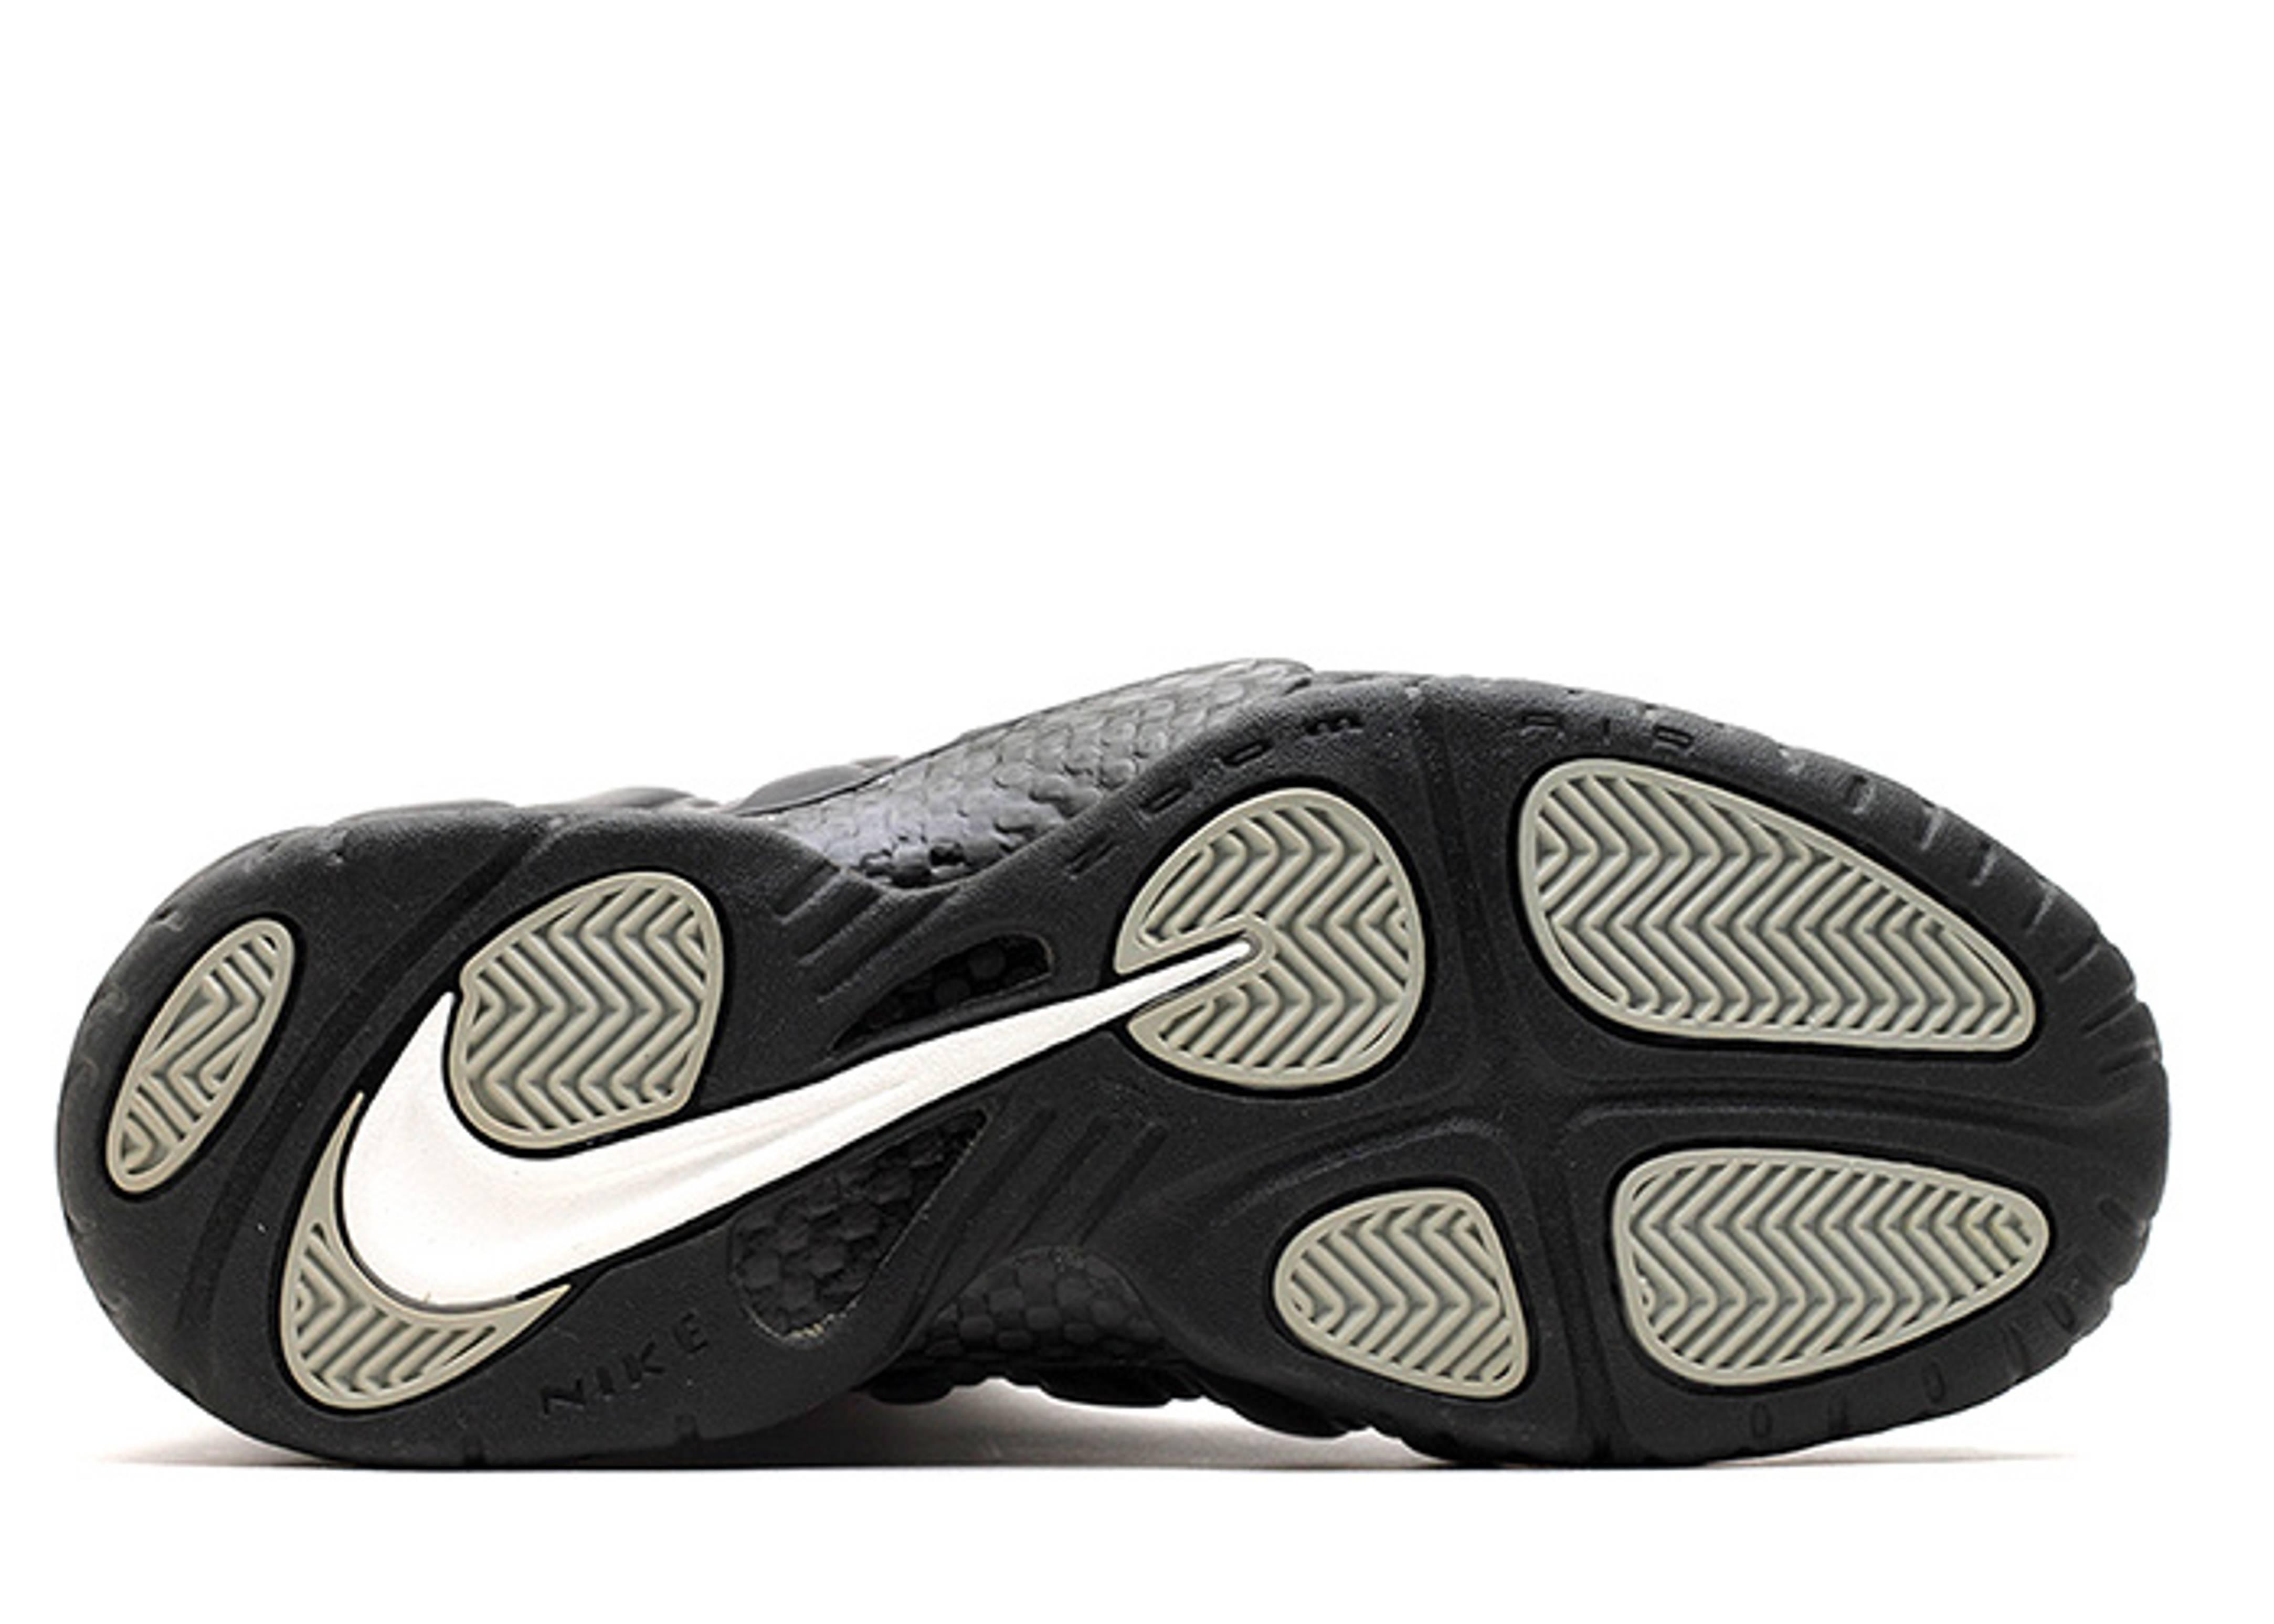 74725a5848388 Air Foamposite Pro - Nike - 630304 002c - black medium grey